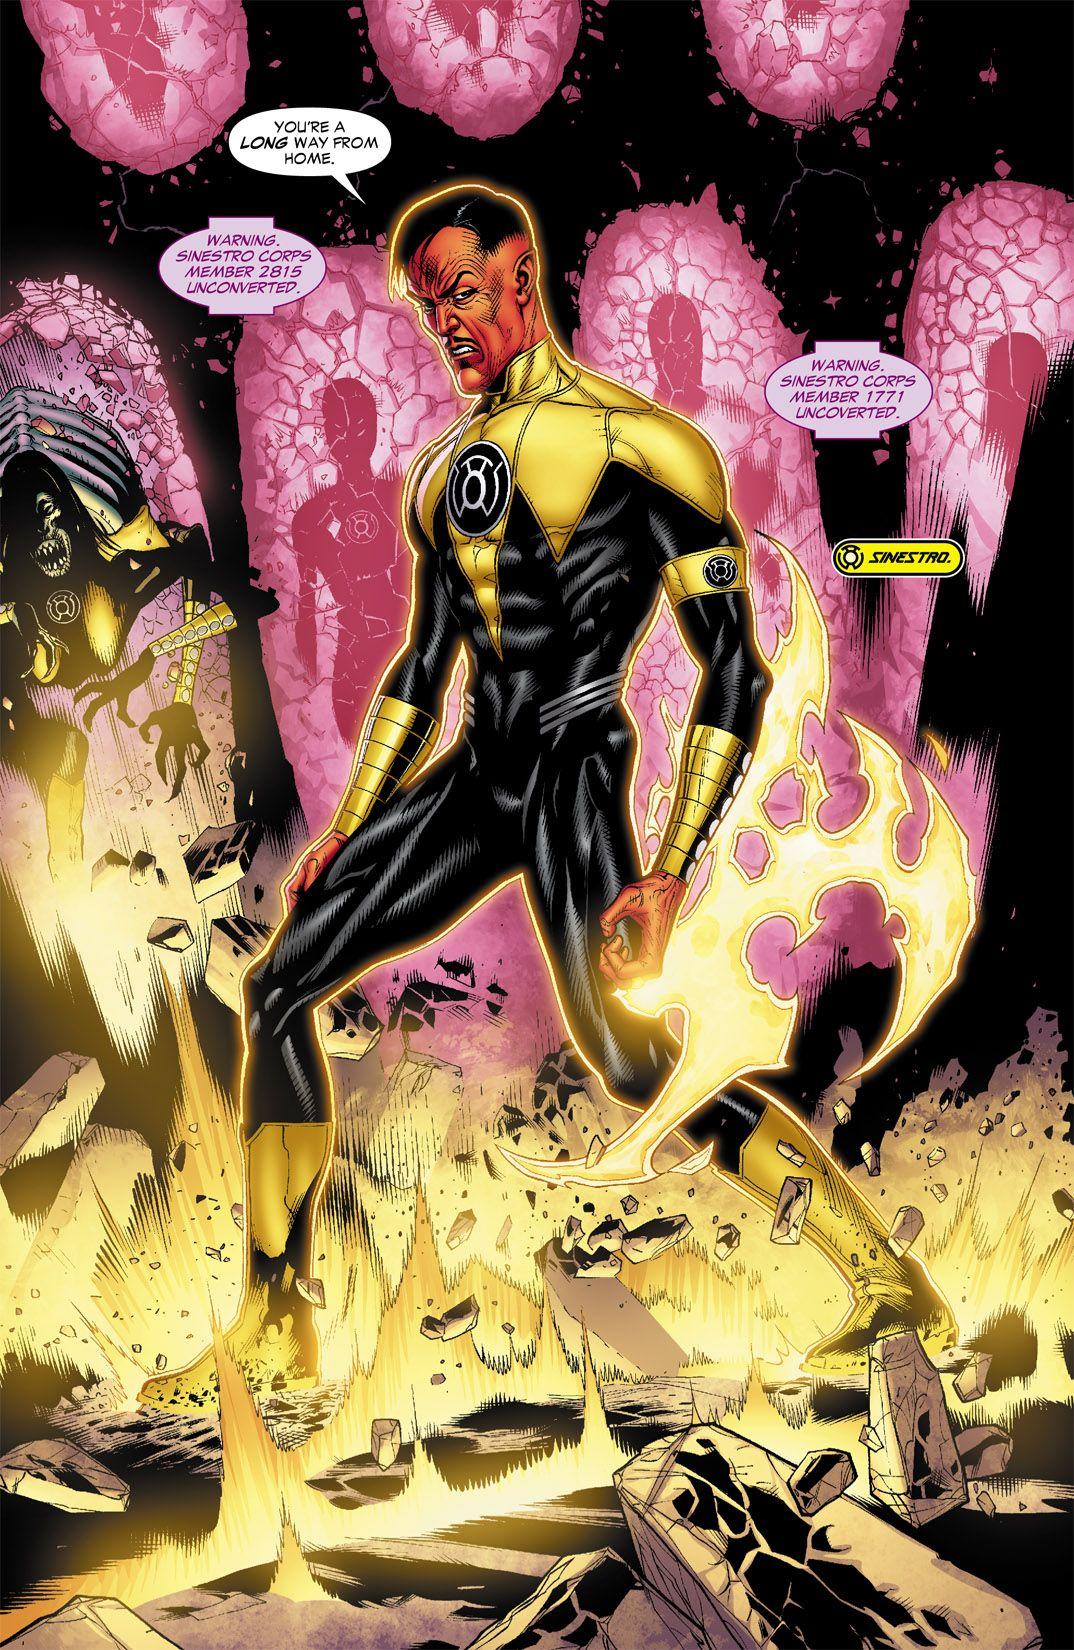 Dc Universe Infinite Explore The Multiverse Dc Comics Artwork Green Lantern Green Lantern Corps